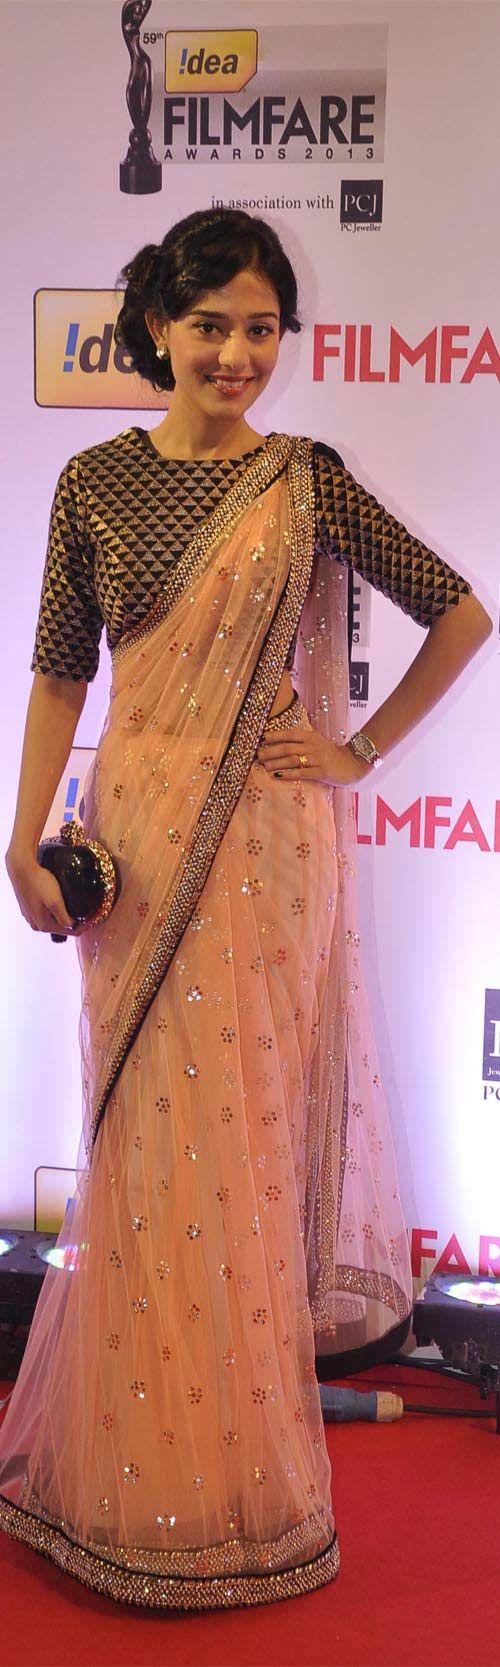 Bollywood Actresses in Sarees - 41 Beautiful Hindi Heroines Images 10